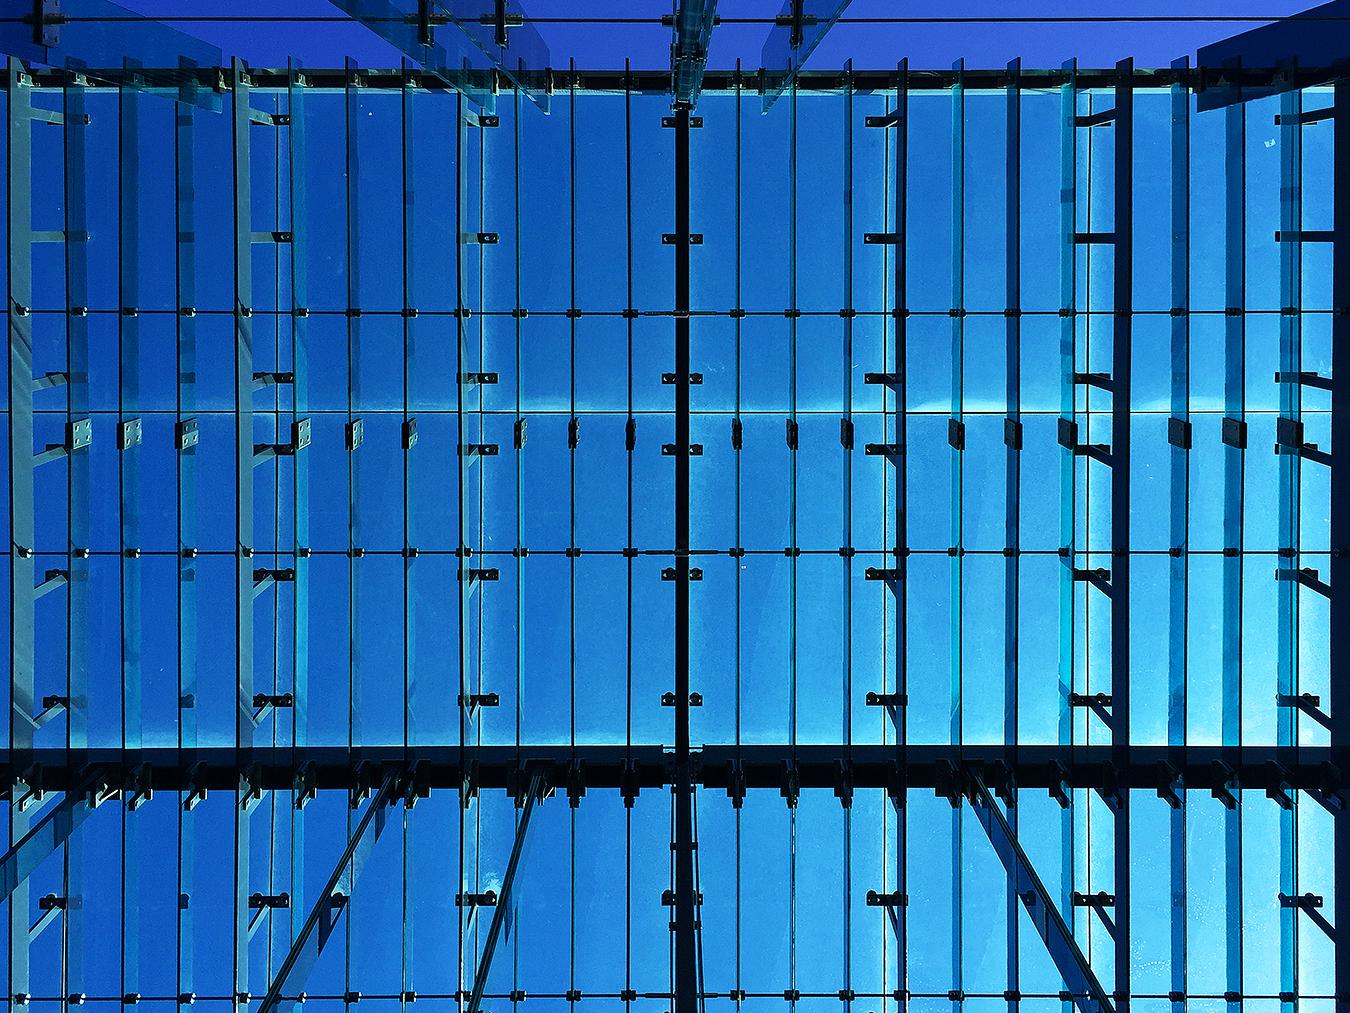 4_Mu_Qiao_travel_Photography_Miami_Key_West_Florida_modern_skylight